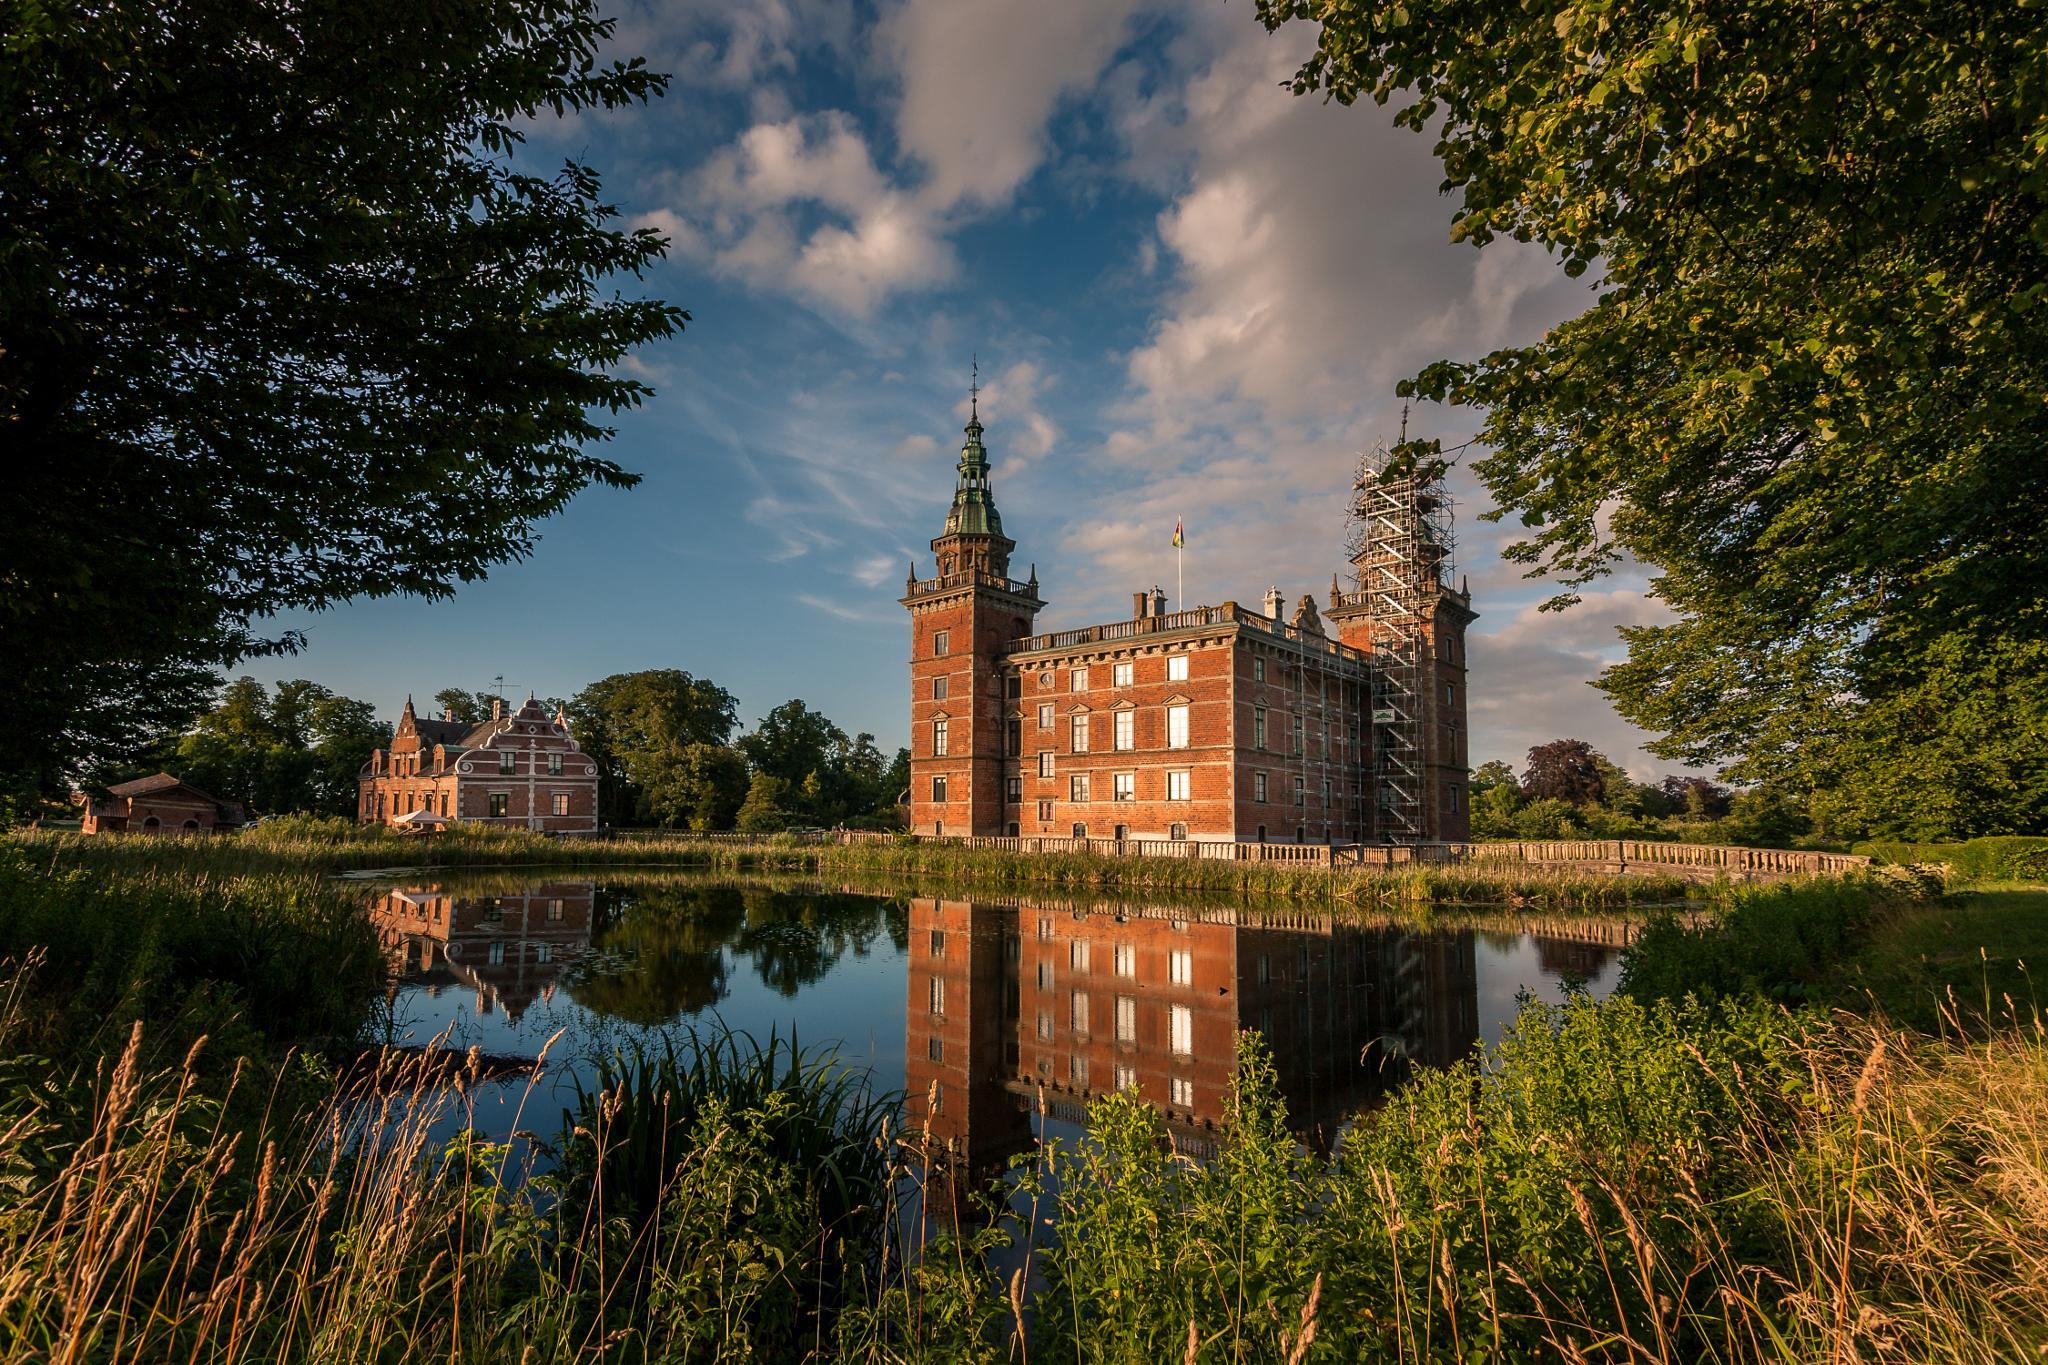 Marsvinsholms Castle by Mirza Buljusmic